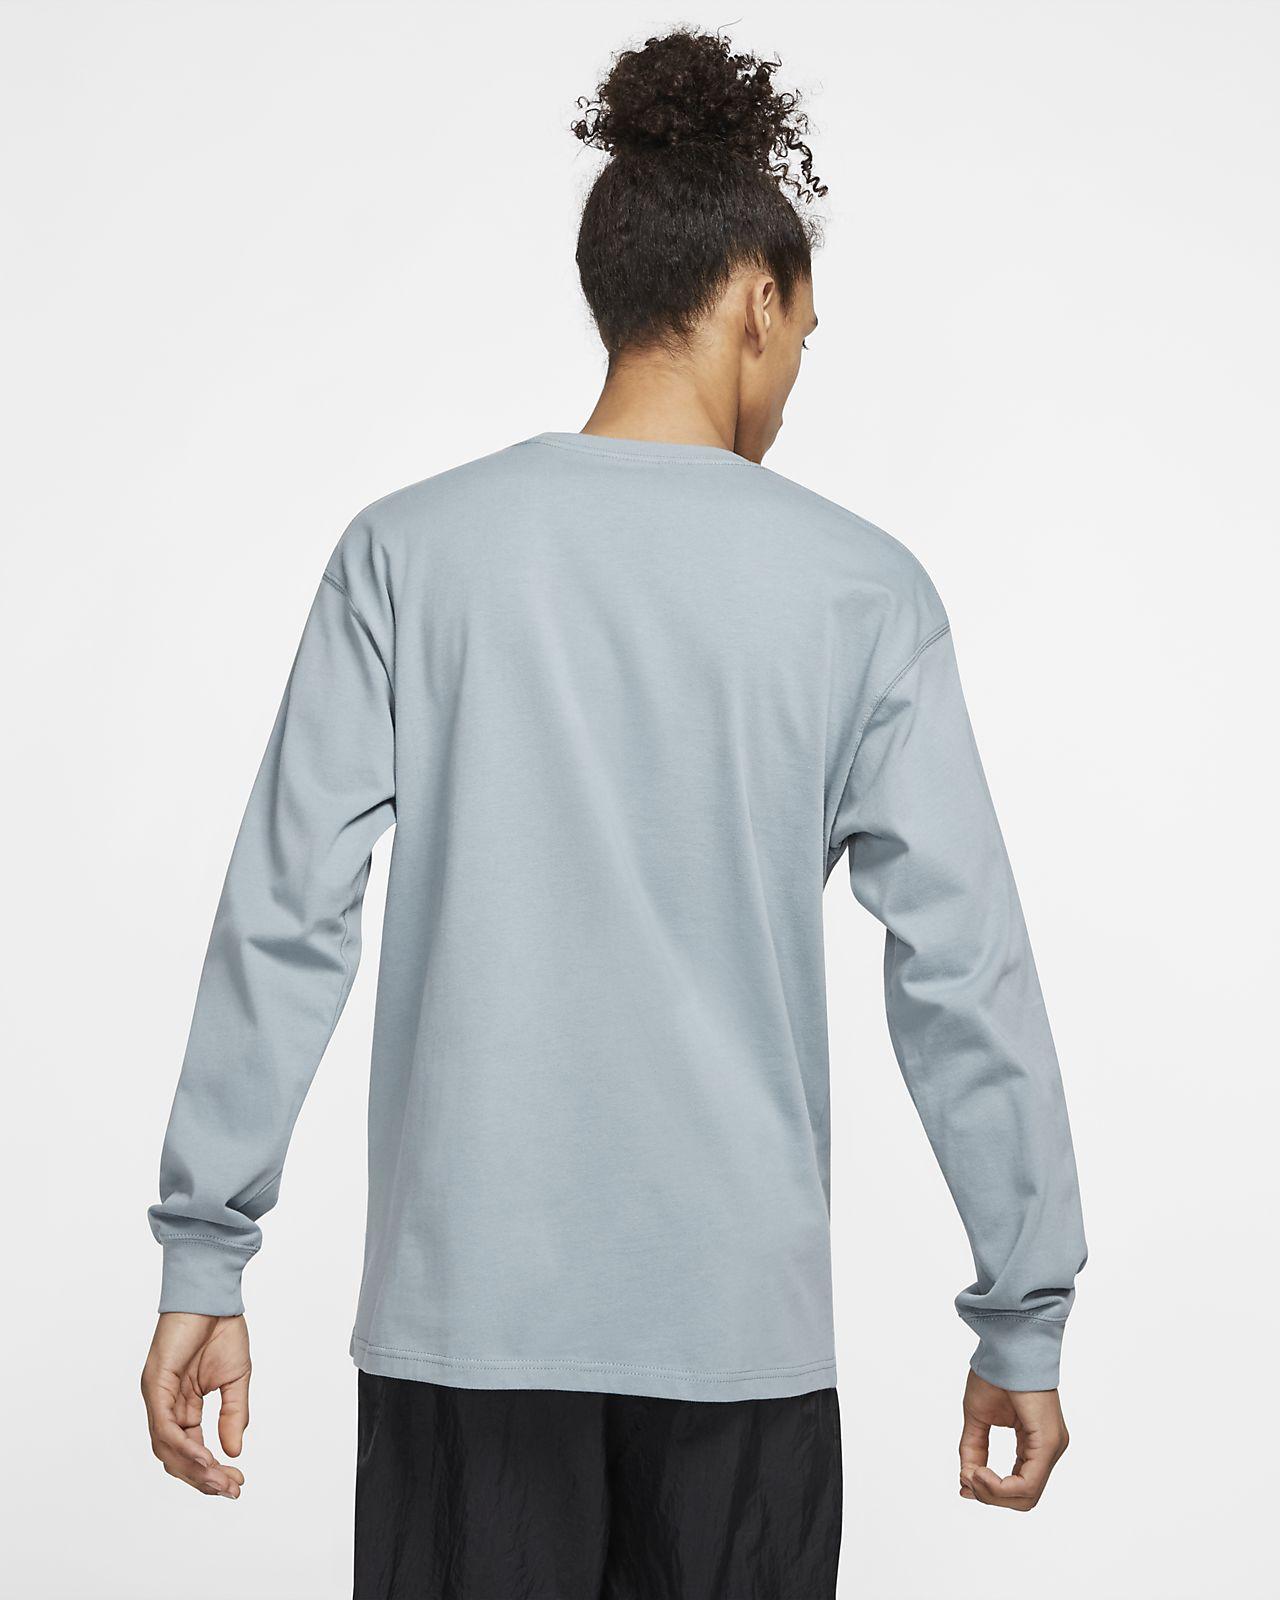 a97a0c6d980e Nike ACG Long-Sleeve T-Shirt. Nike.com